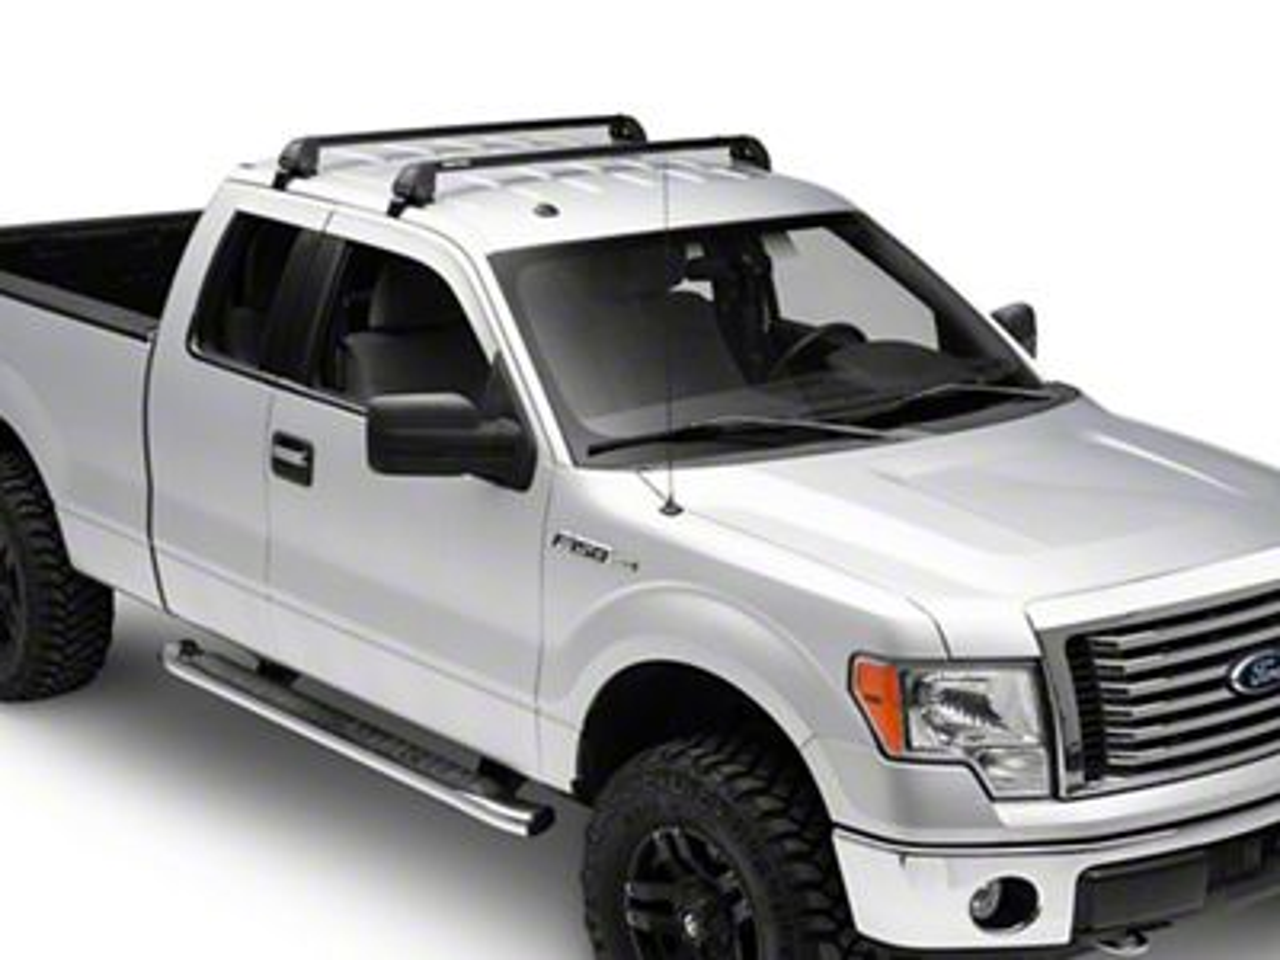 Rhino-Rack Vortex 2500 RS 2-Bar Roof Rack - Black (04-14 F-150 SuperCab)